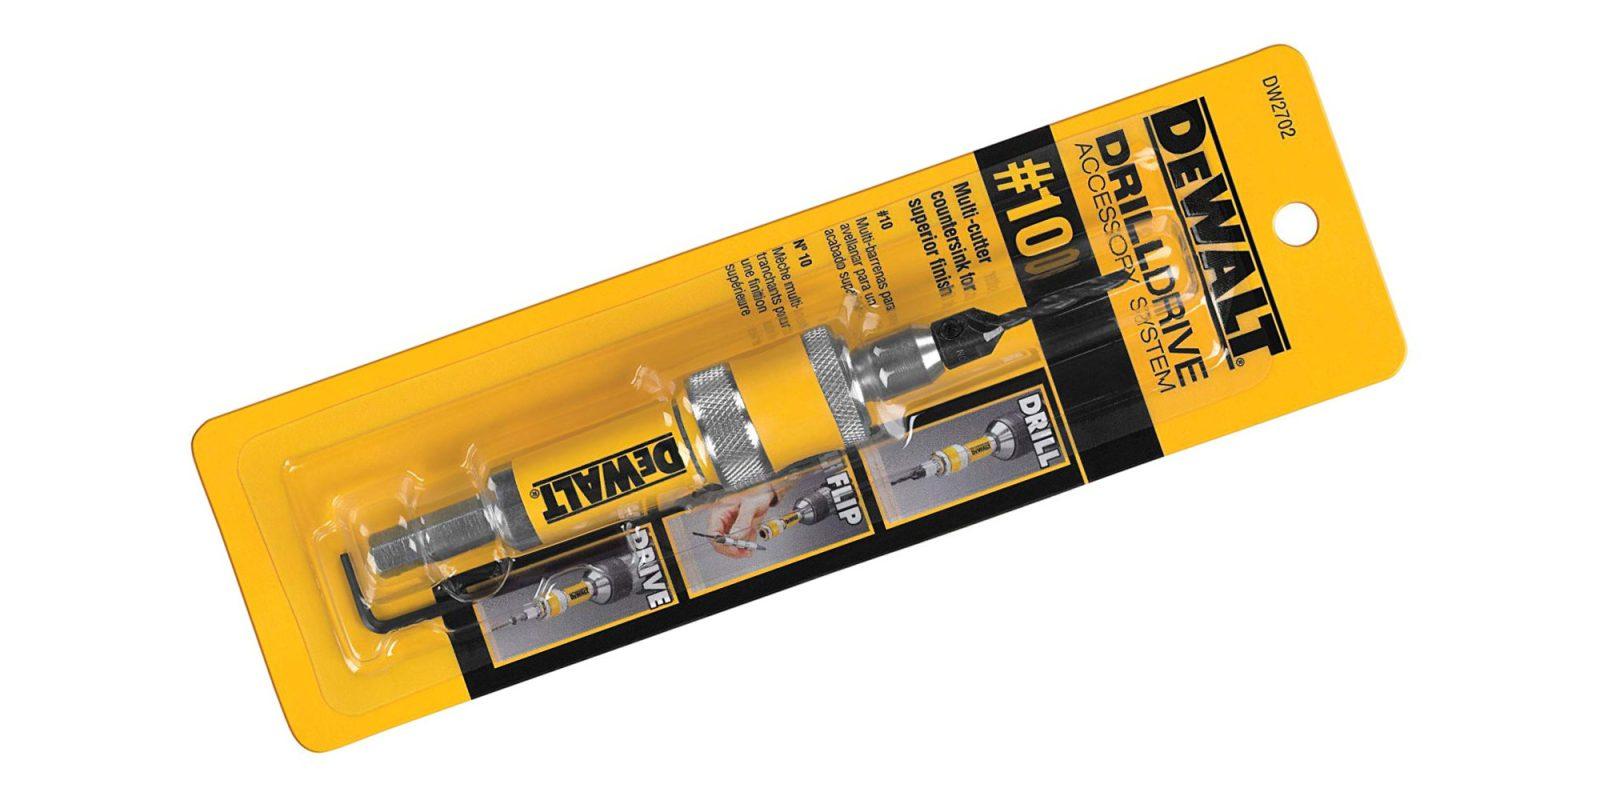 DEWALT's Flip Drive accessory makes pre-drilling a breeze: $10 (Save 30%)